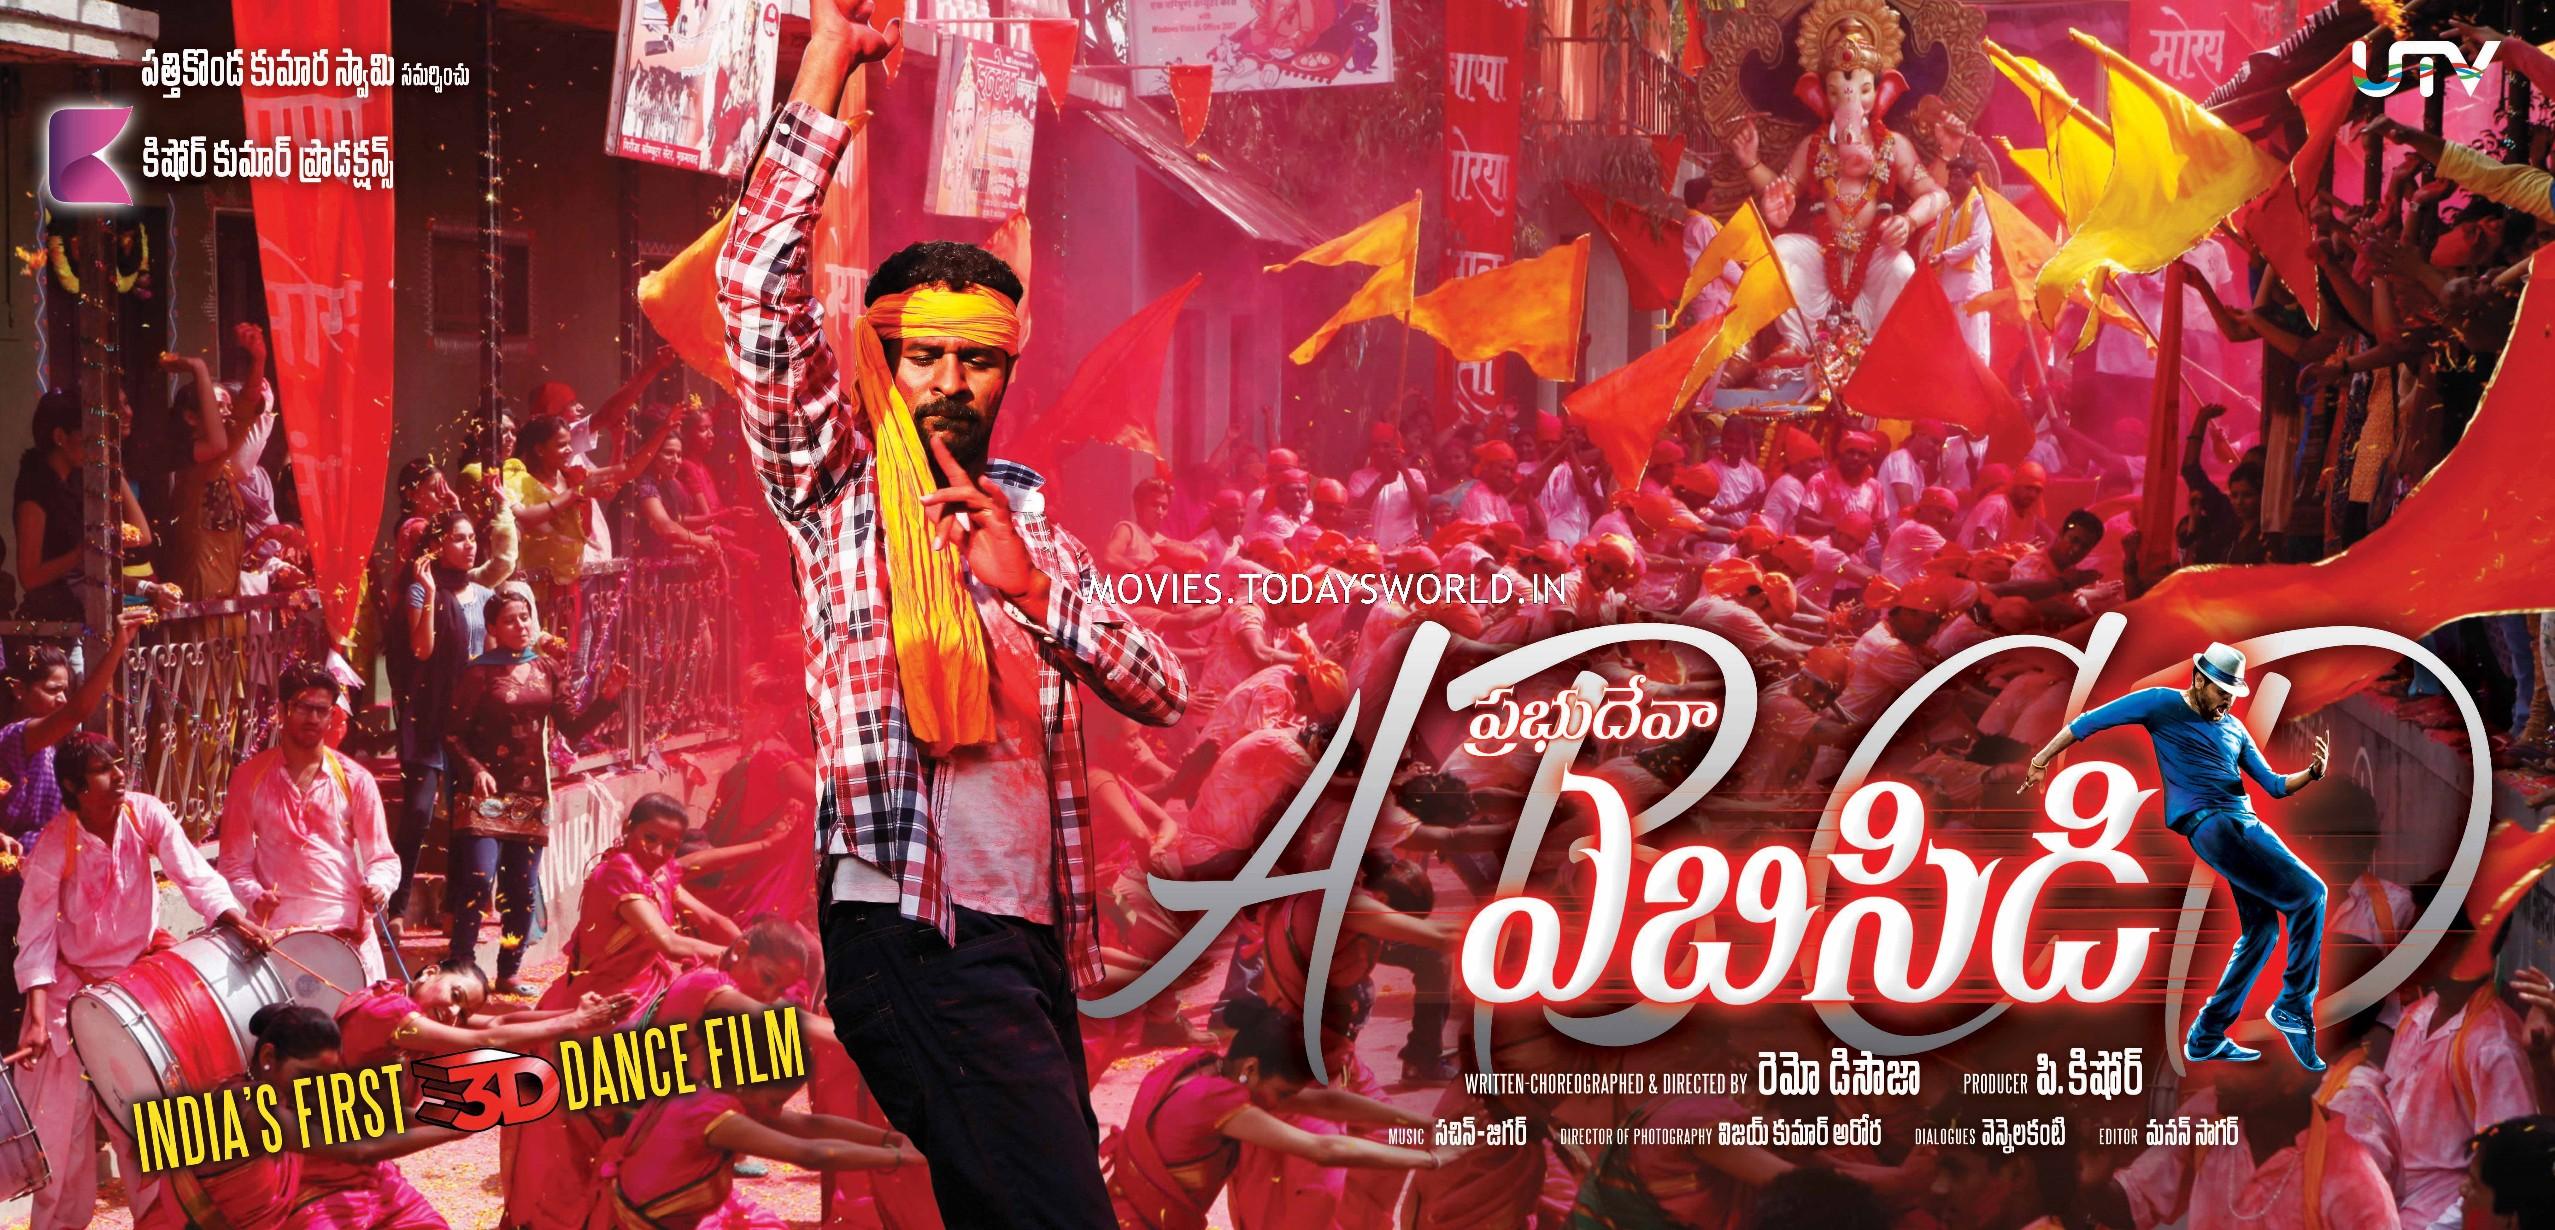 https://1.bp.blogspot.com/-F77Krh6Ql0w/UQEgGG93DwI/AAAAAAAAXes/_xqjT_tenHo/s9000/ABCD+Movie+WallPapers,+ABCD+Telugu+Movie+Ultra+HD+Wallpapers,+HD+Posters+-+ TodaysWorld.in + (1) .jpg